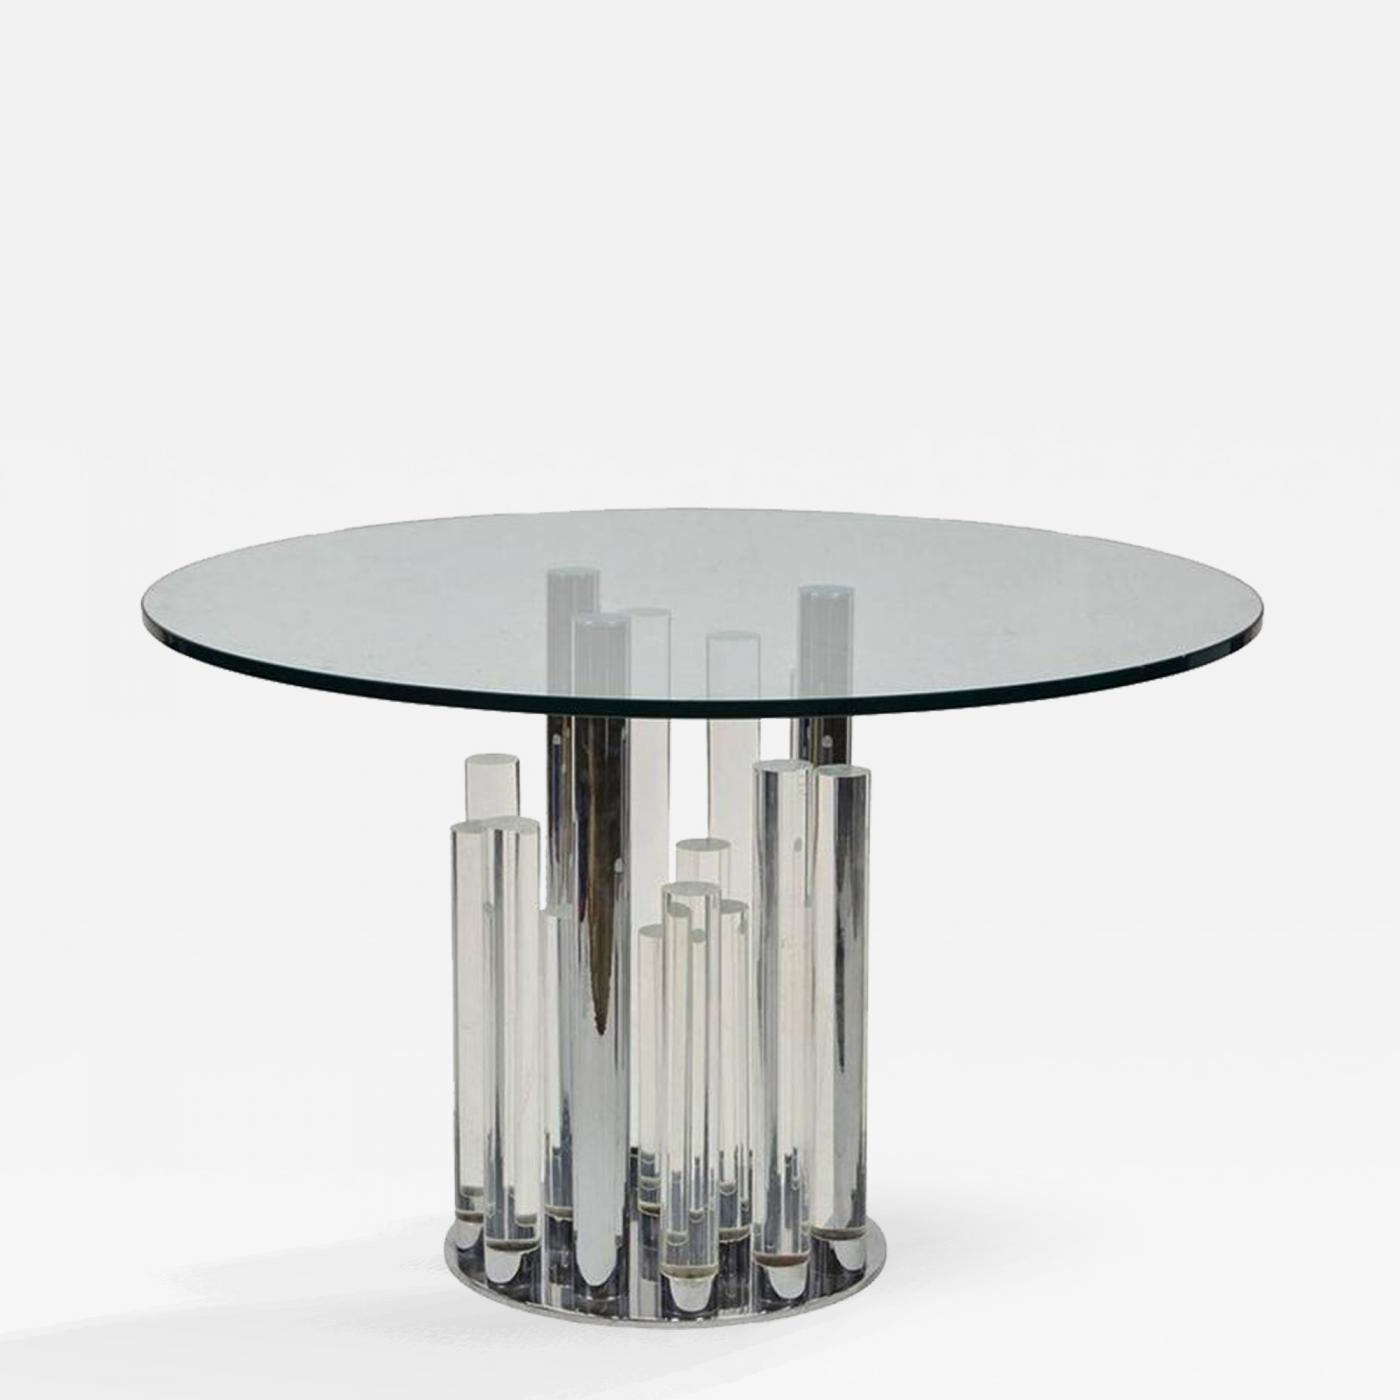 charles hollis jones skyscraper dining center table in lucite